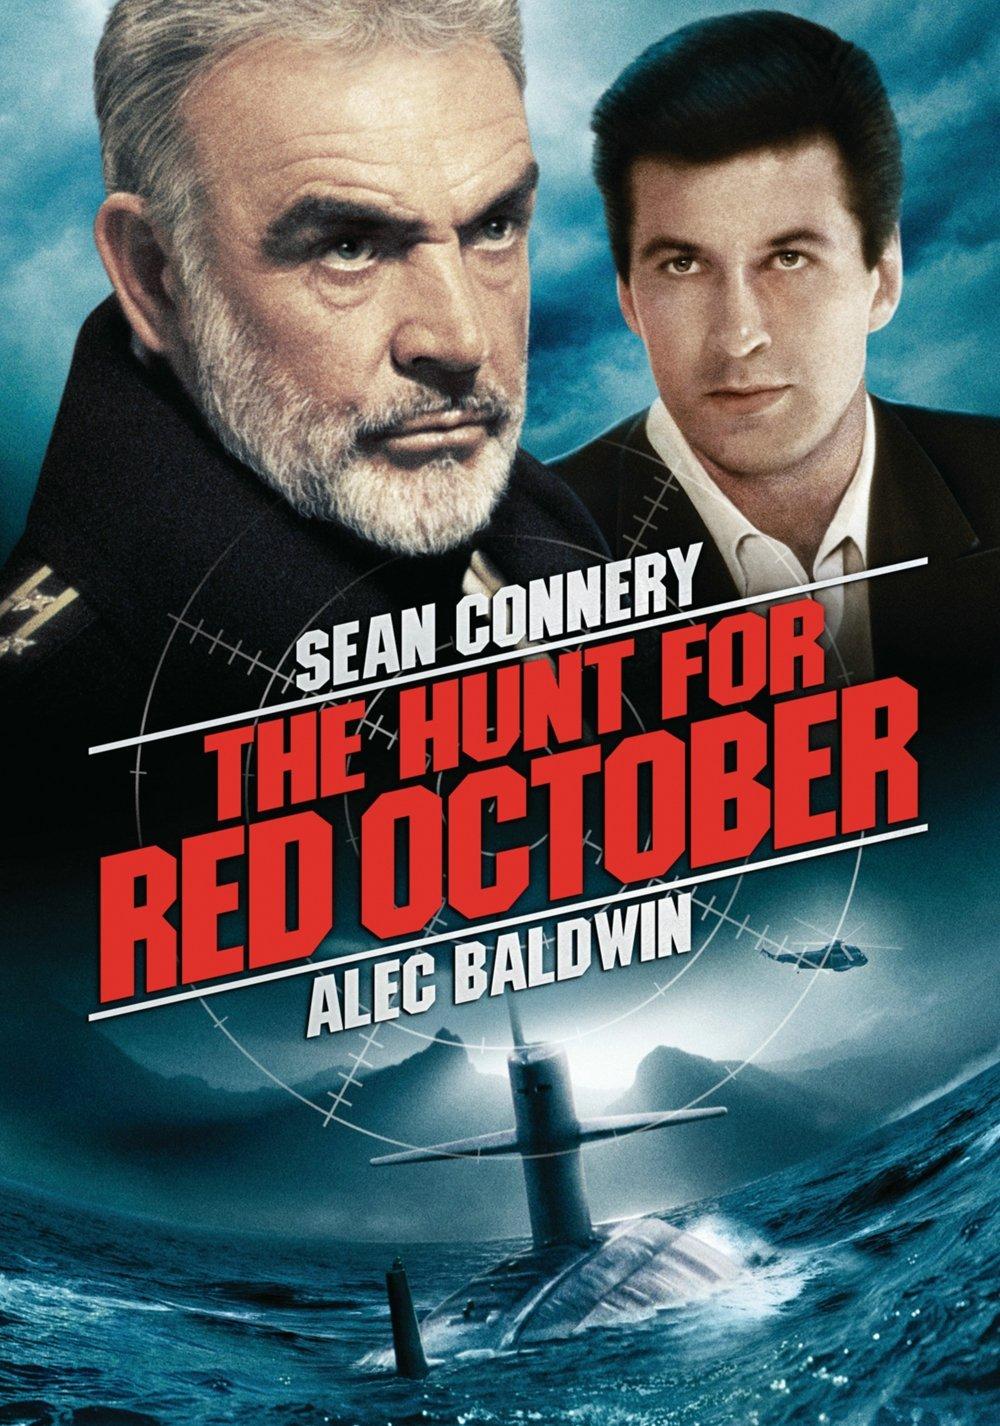 The Hunt for Red October ล่าตุลาแดง [HD][พากย์ไทย]